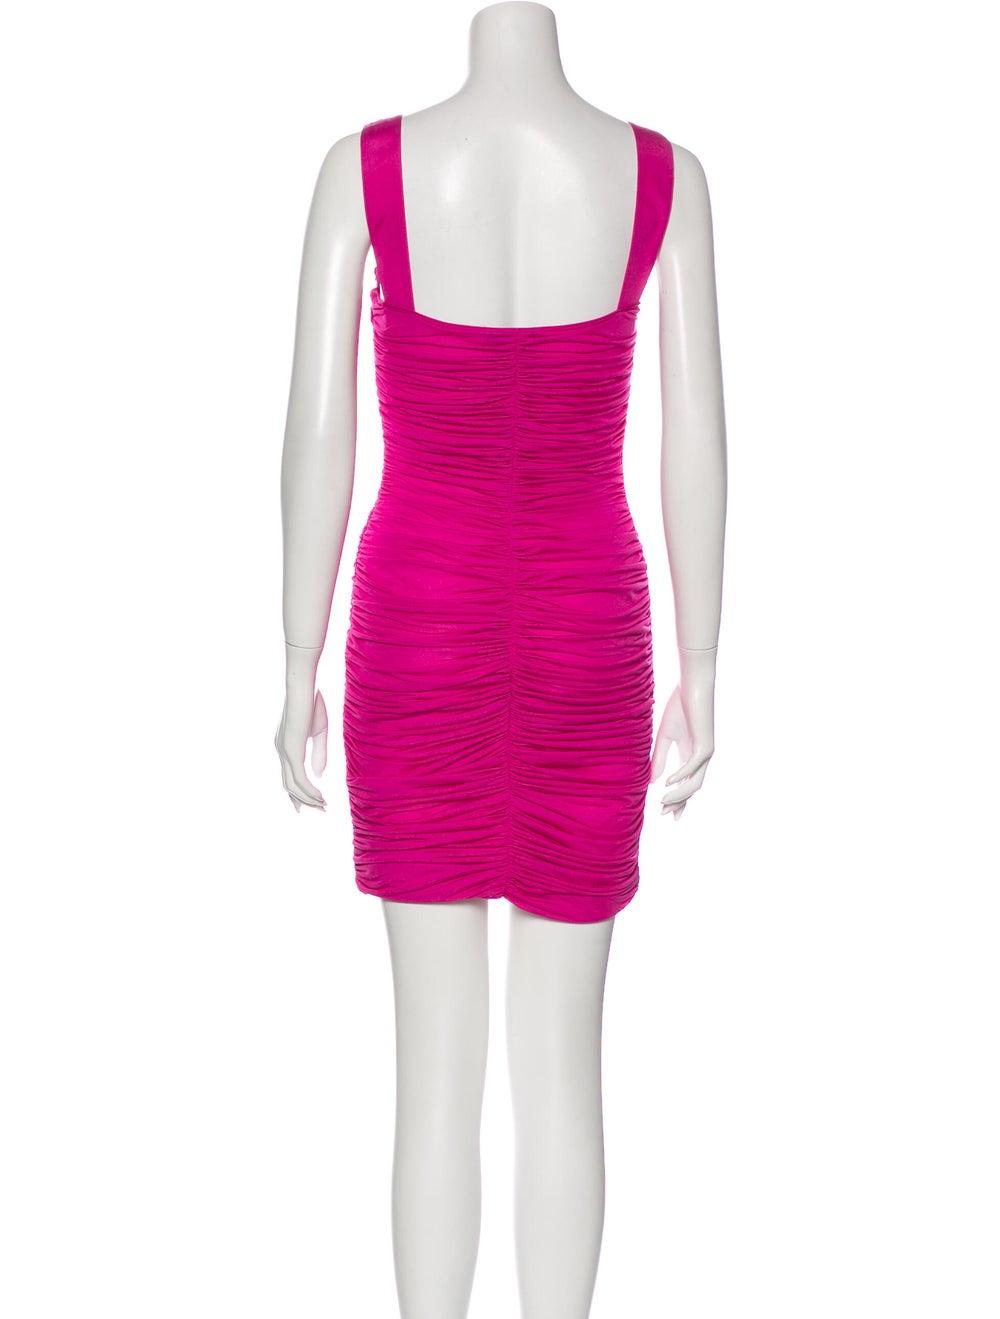 Blumarine Square Neckline Mini Dress Pink - image 3